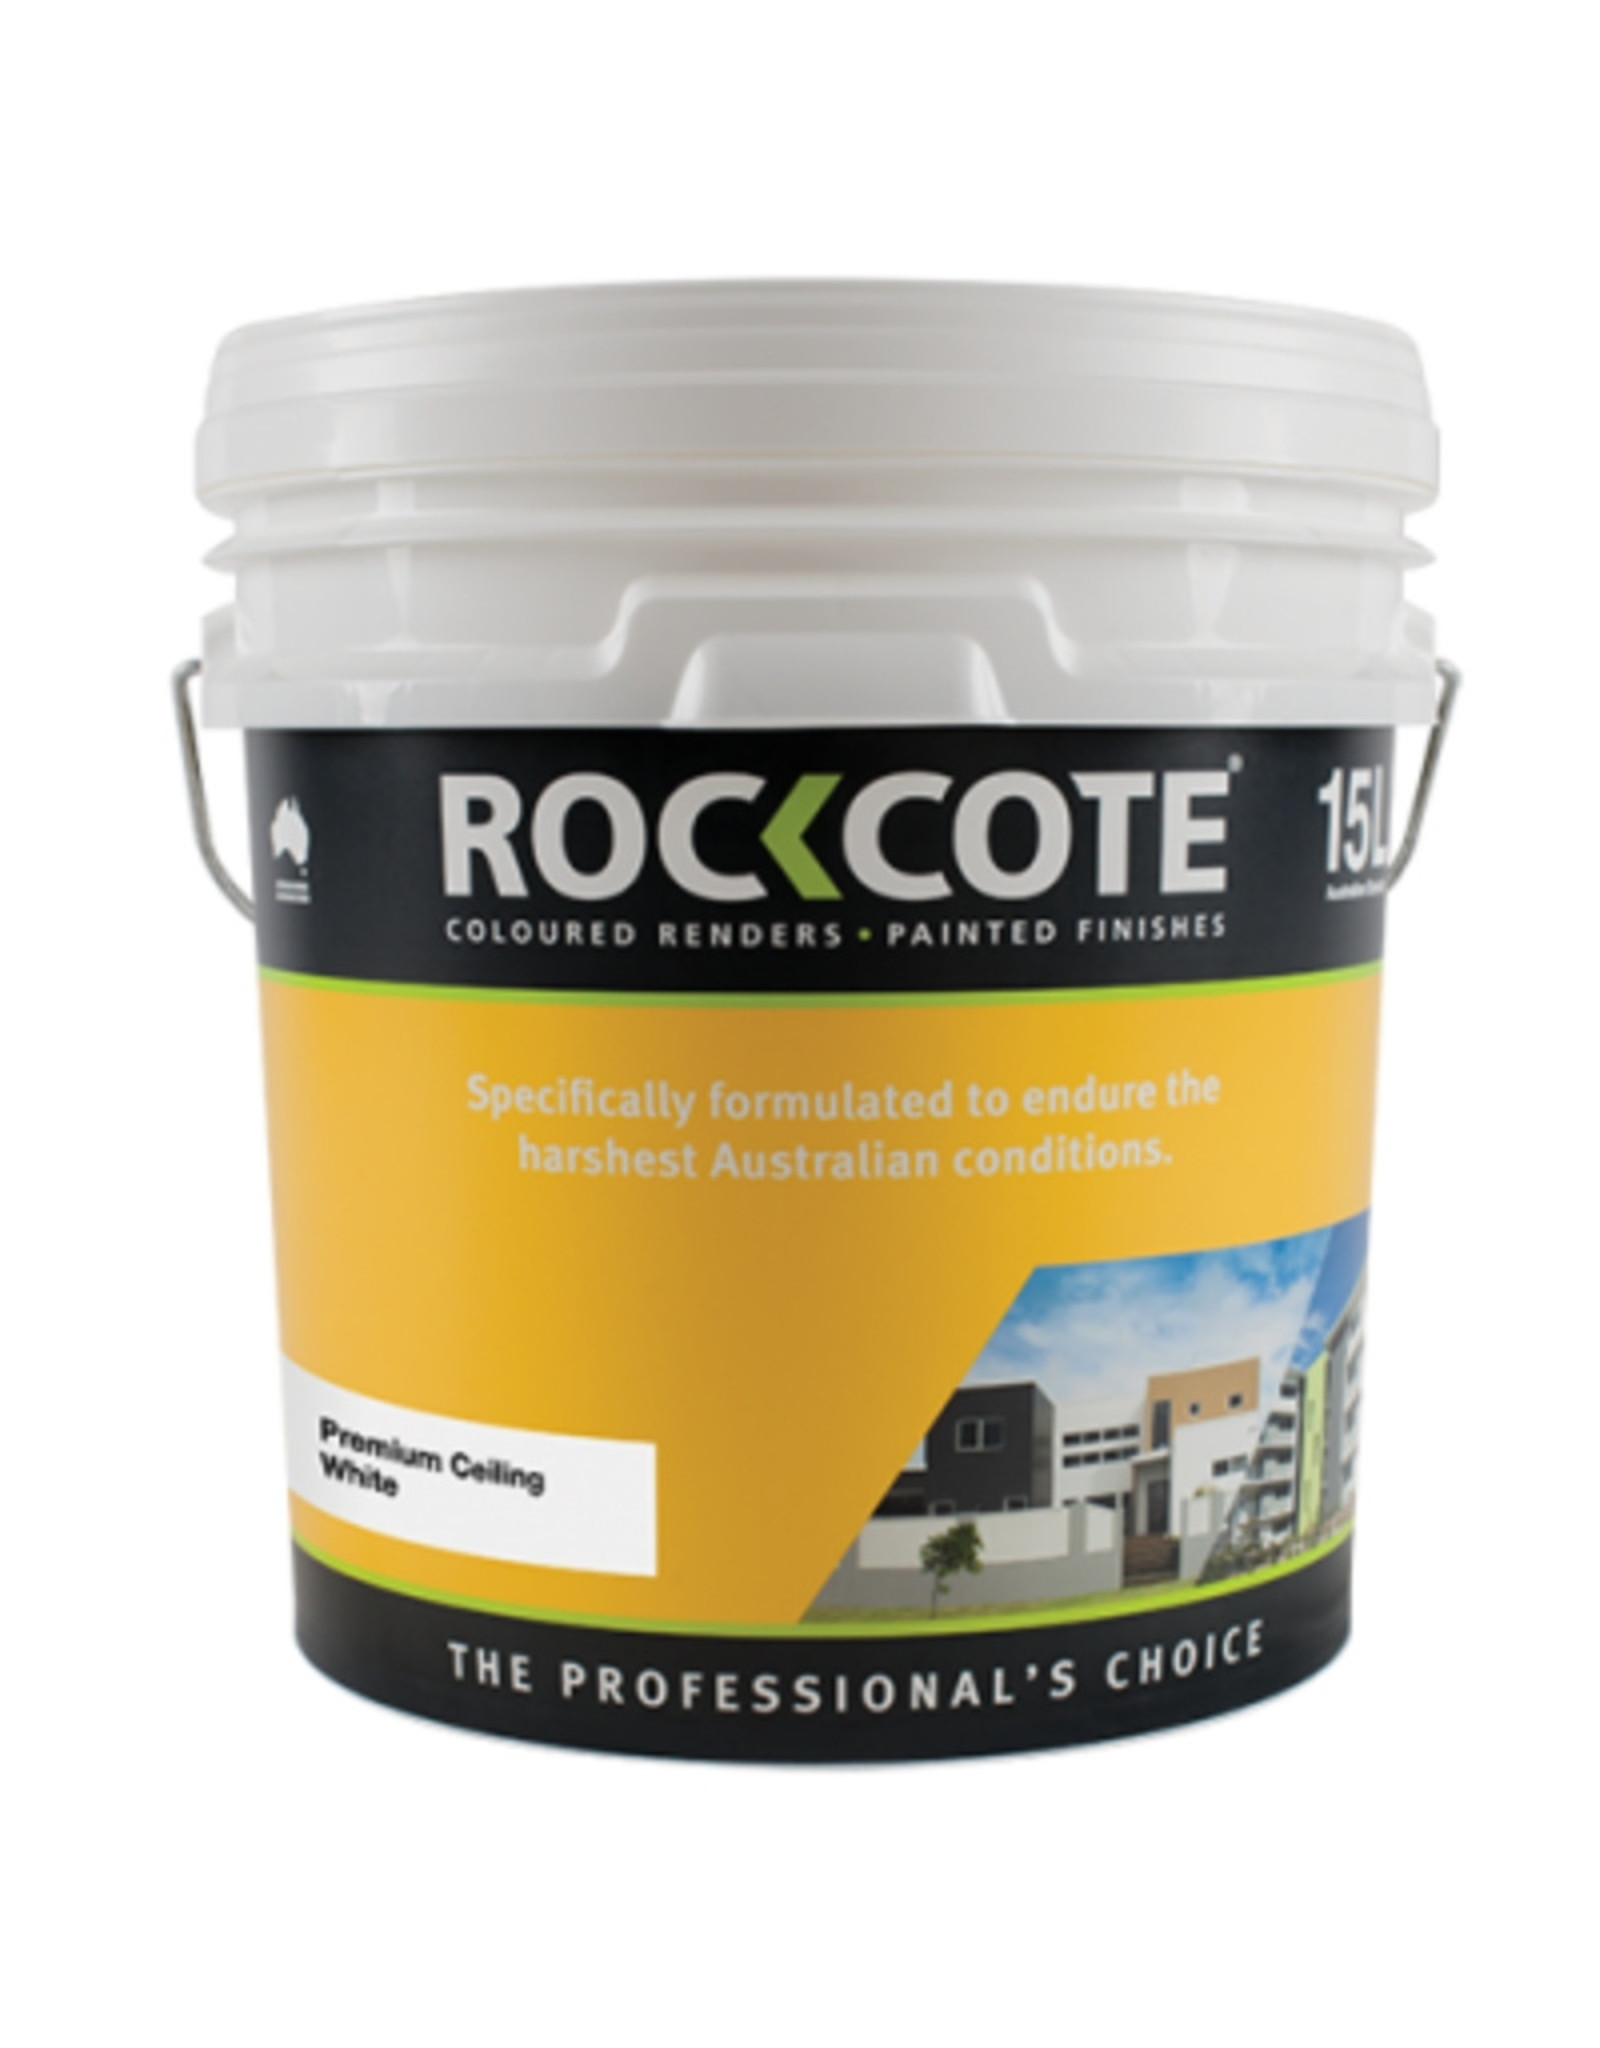 ROCKCOTE Premium Ceiling White